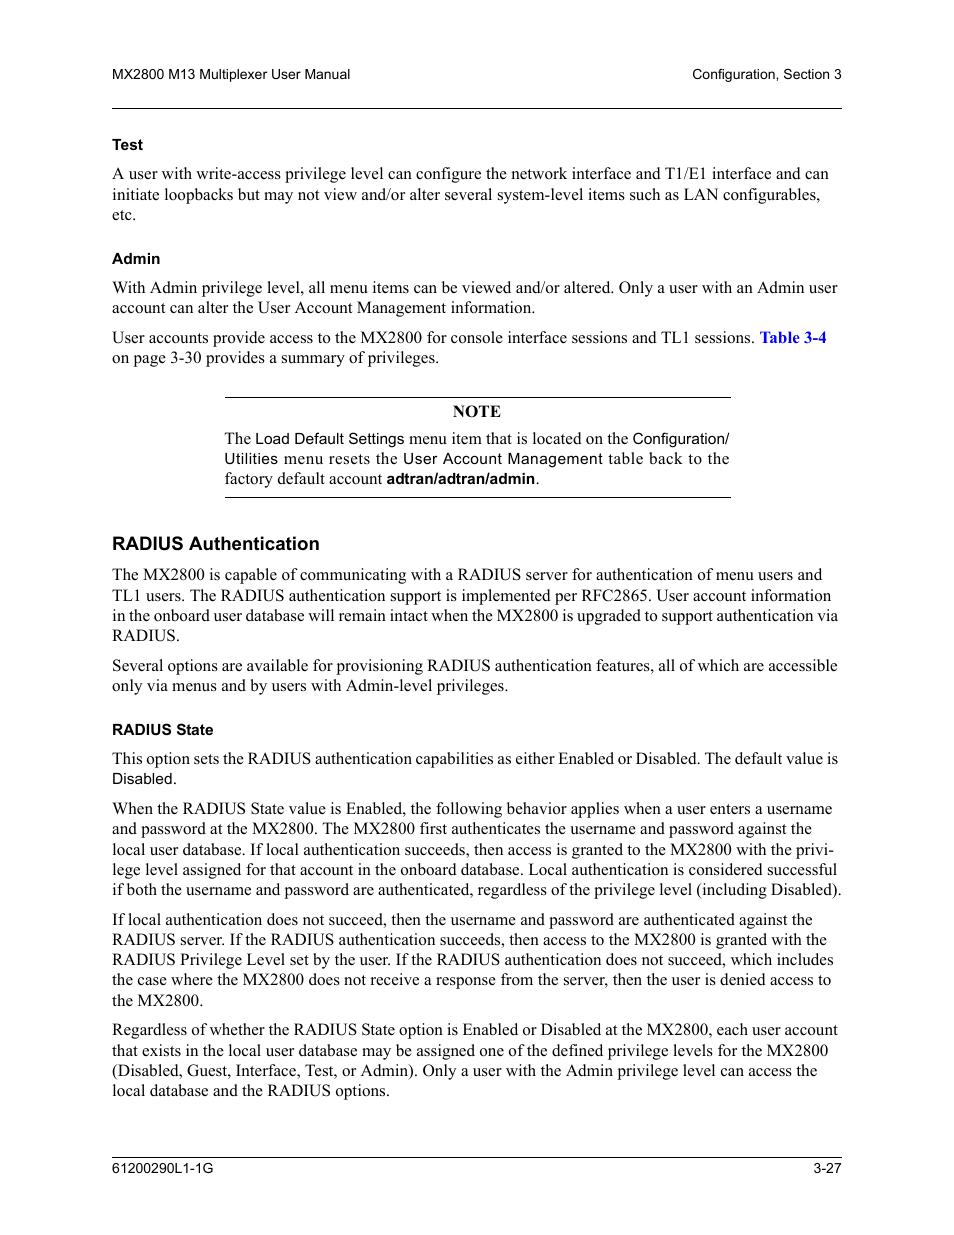 Test, Admin, Radius authentication | Radius state, Test -27 admin -27